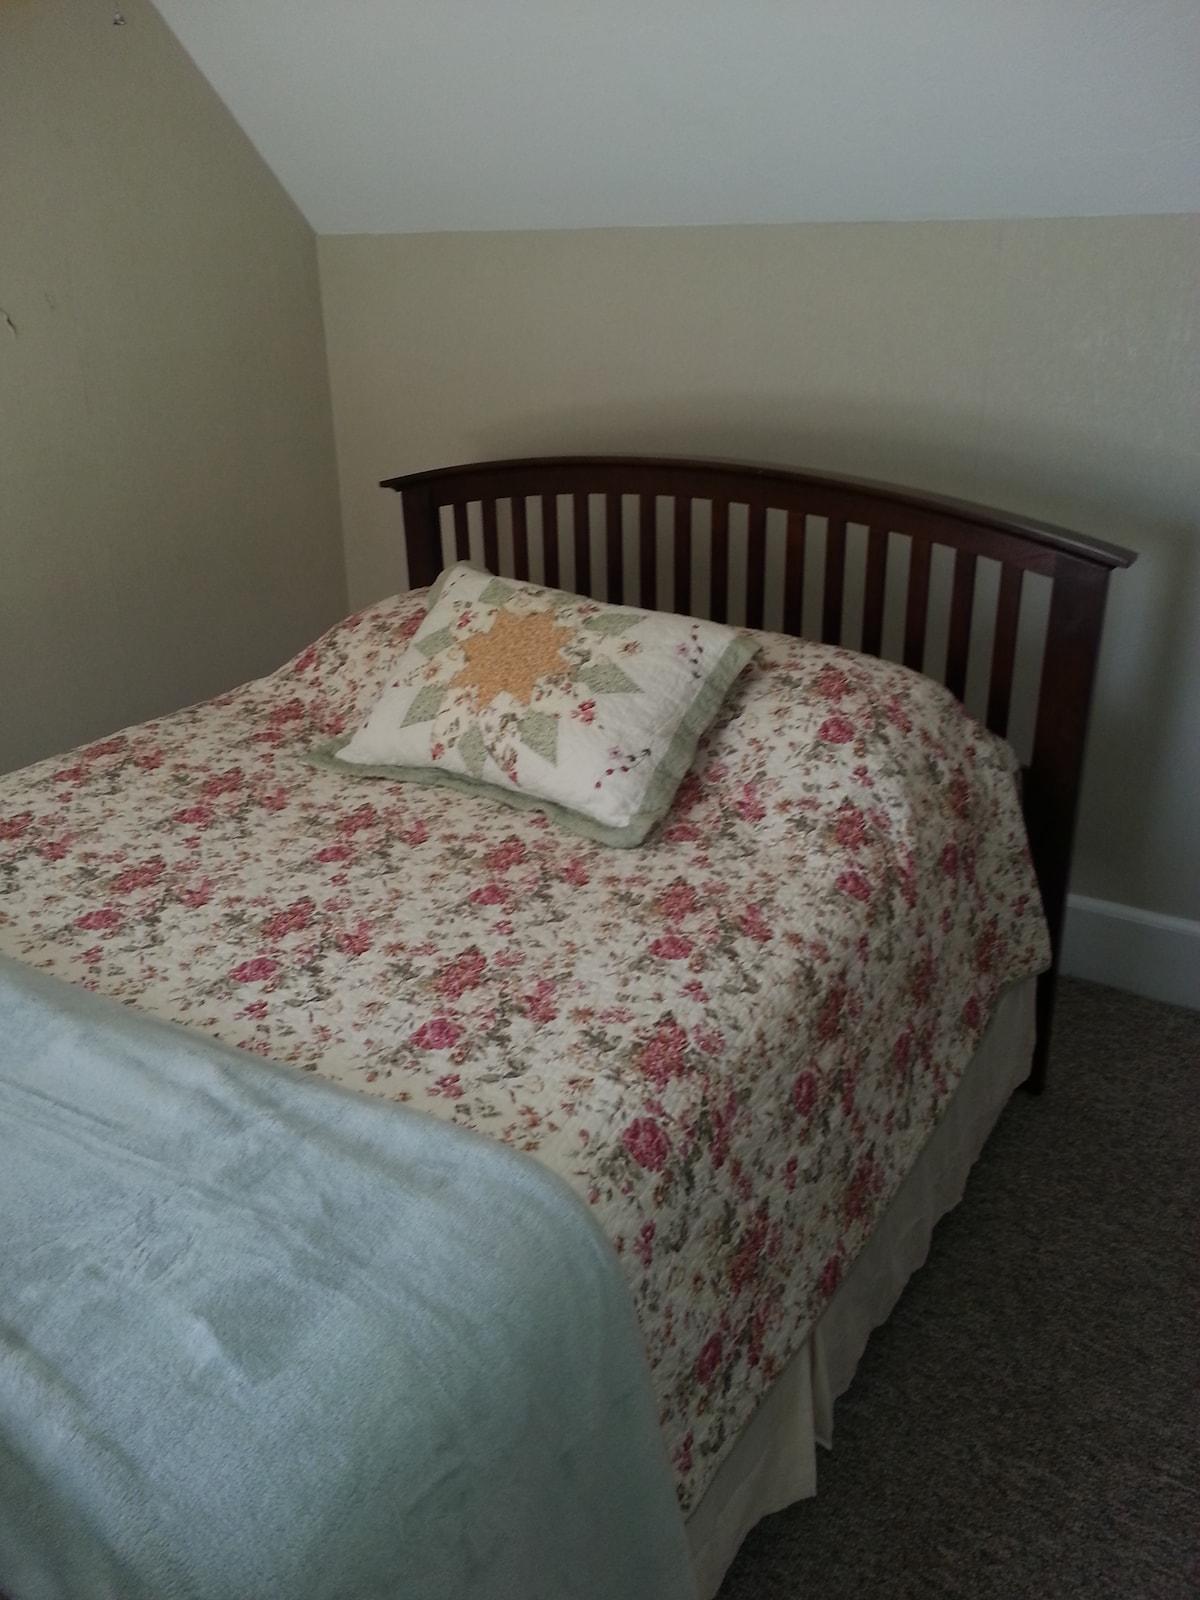 2 Bedroom Apartment Near Boston, MA